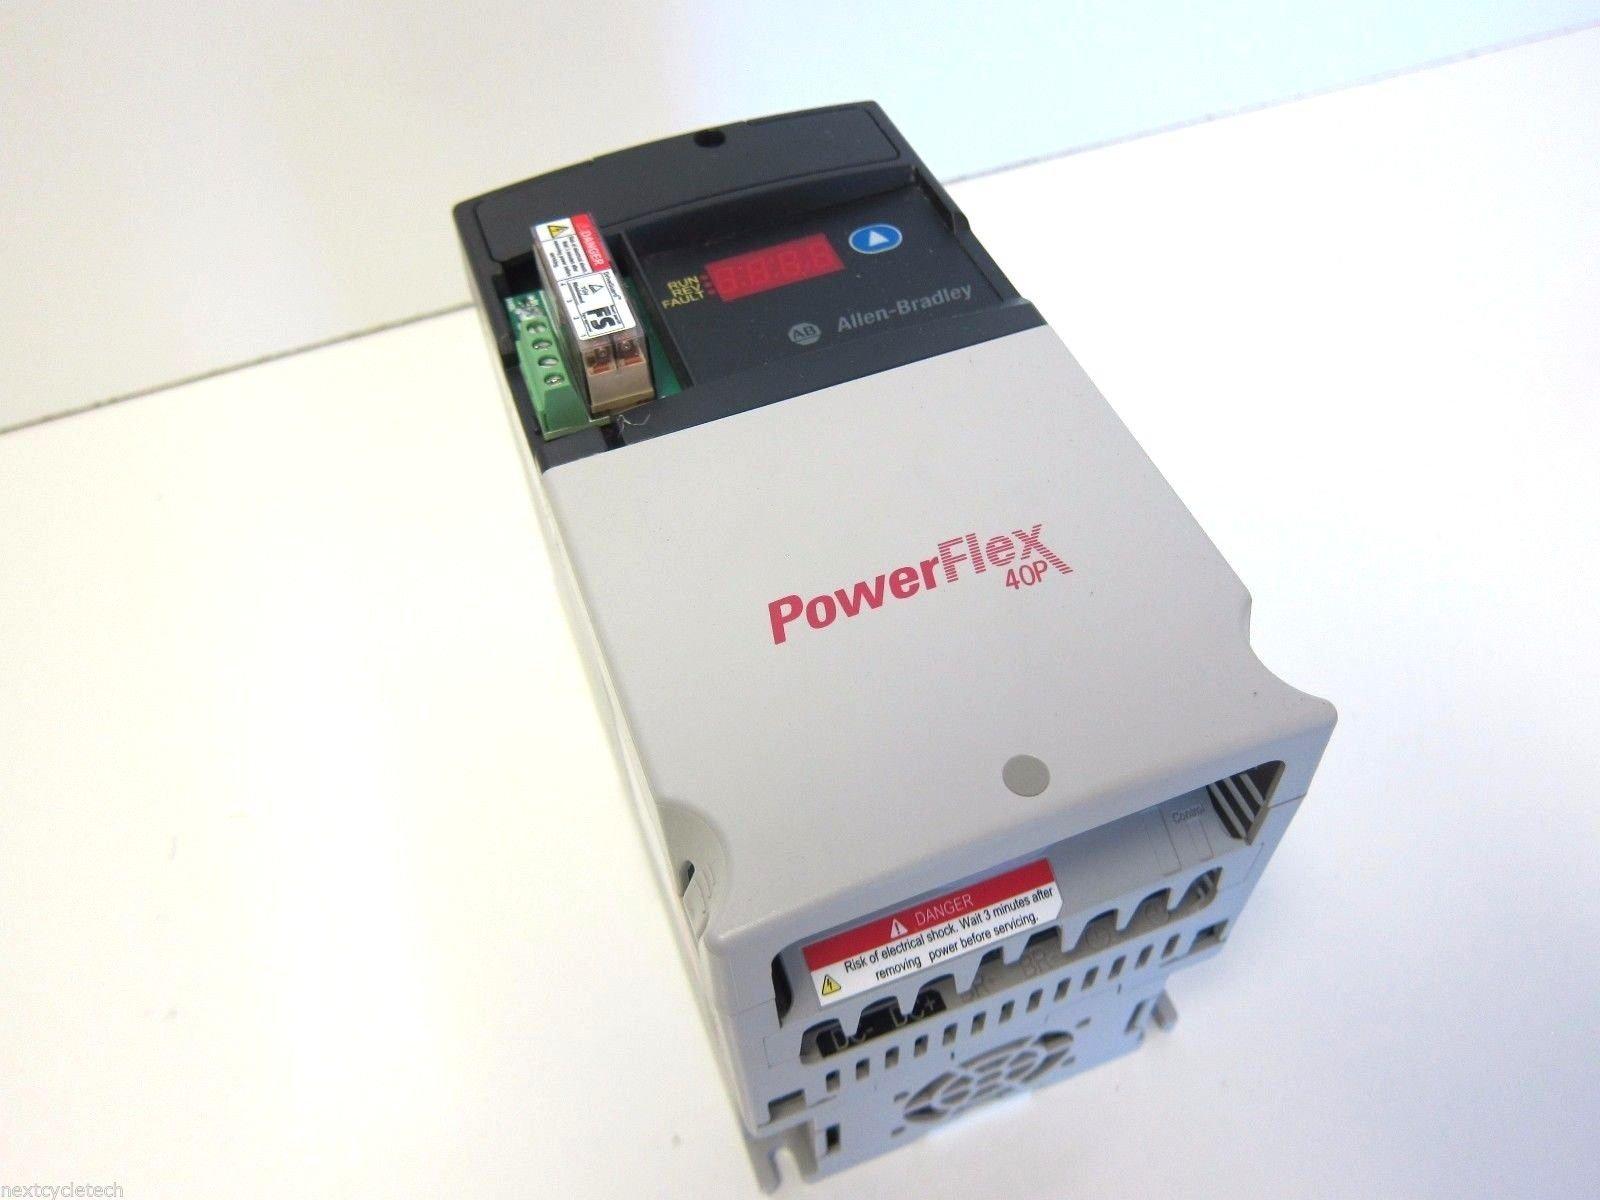 Allen Bradley 22D-D2P3N104 Powerflex40P AC Drive 1HP 3Ph 480VAC